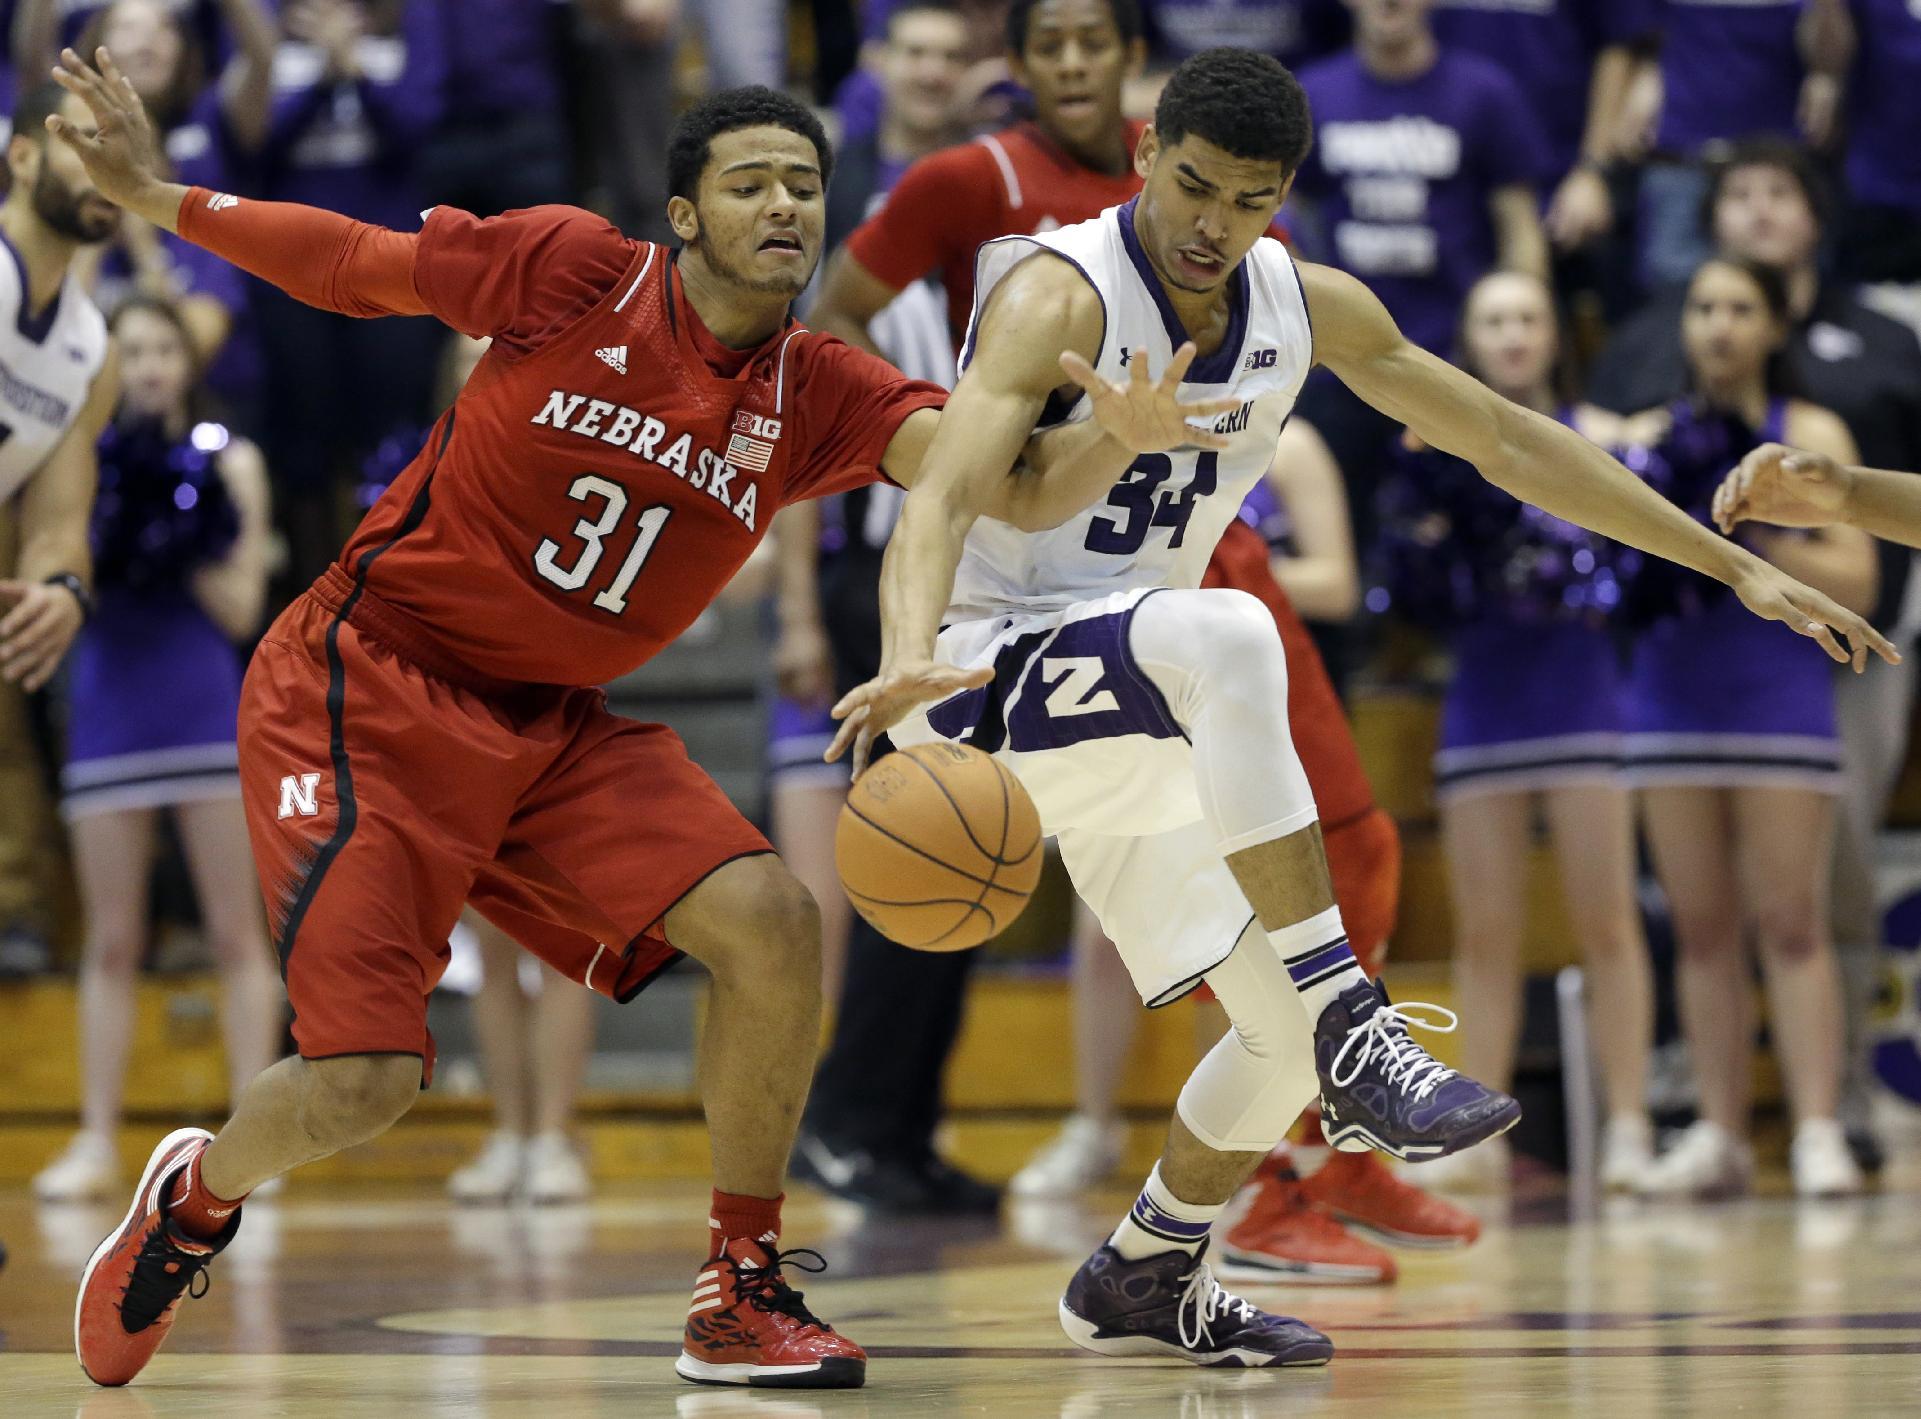 Northwestern guard Sanjay Lumpkin, right, and Nebraska guard Shavon Shields battle for a loose ball during the second half of an NCAA college basketball game in Evanston, Ill., on Saturday, Feb. 8, 2014. Nebraska won 53-49